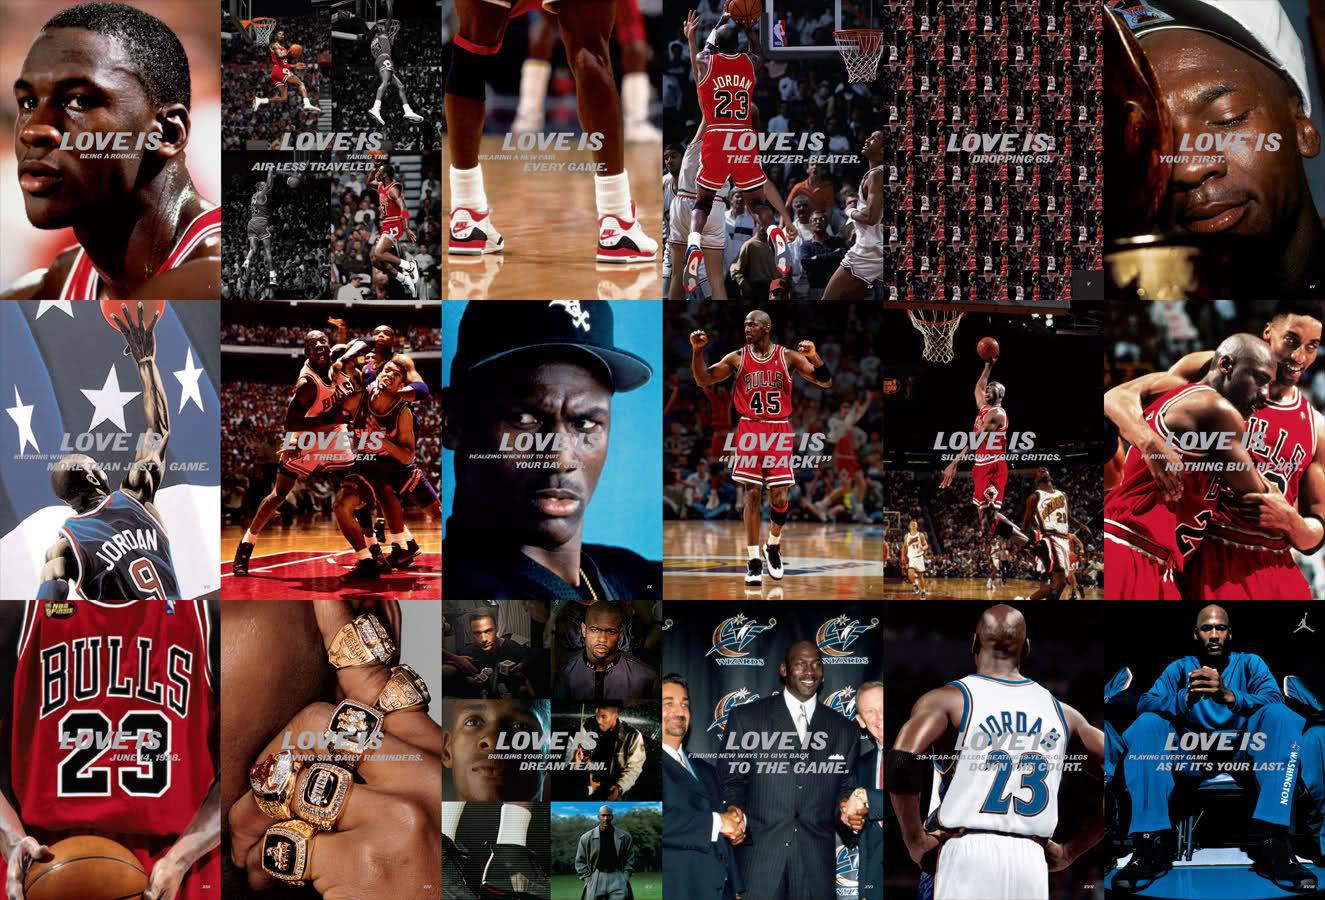 Michael Jordan S Best Commercials Ranked The Washington Post